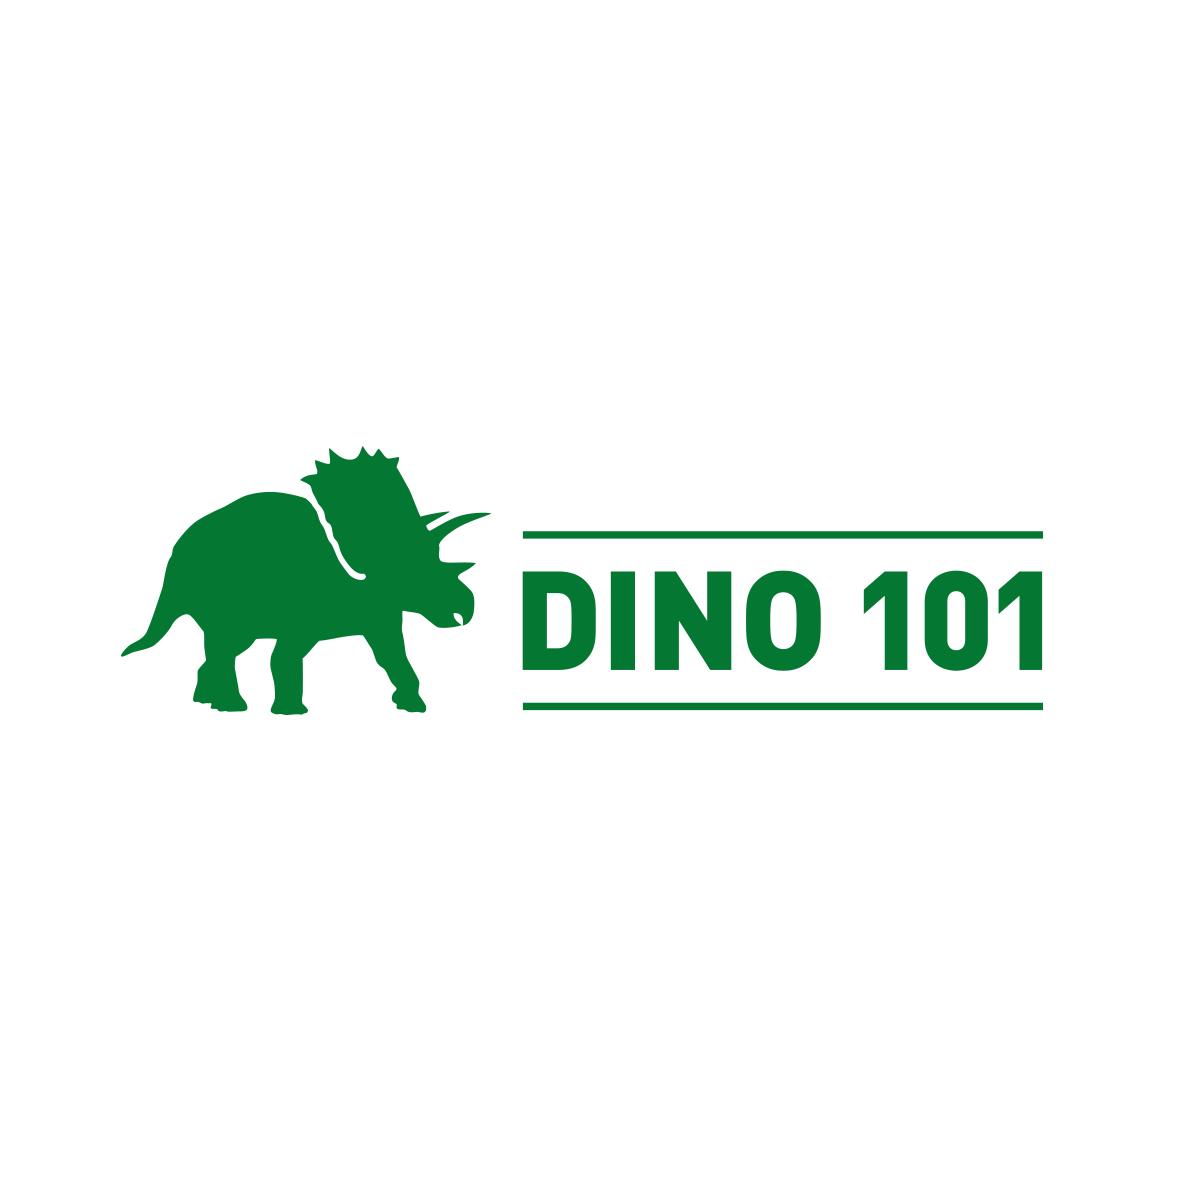 Dino 101 logo horizontal orientation